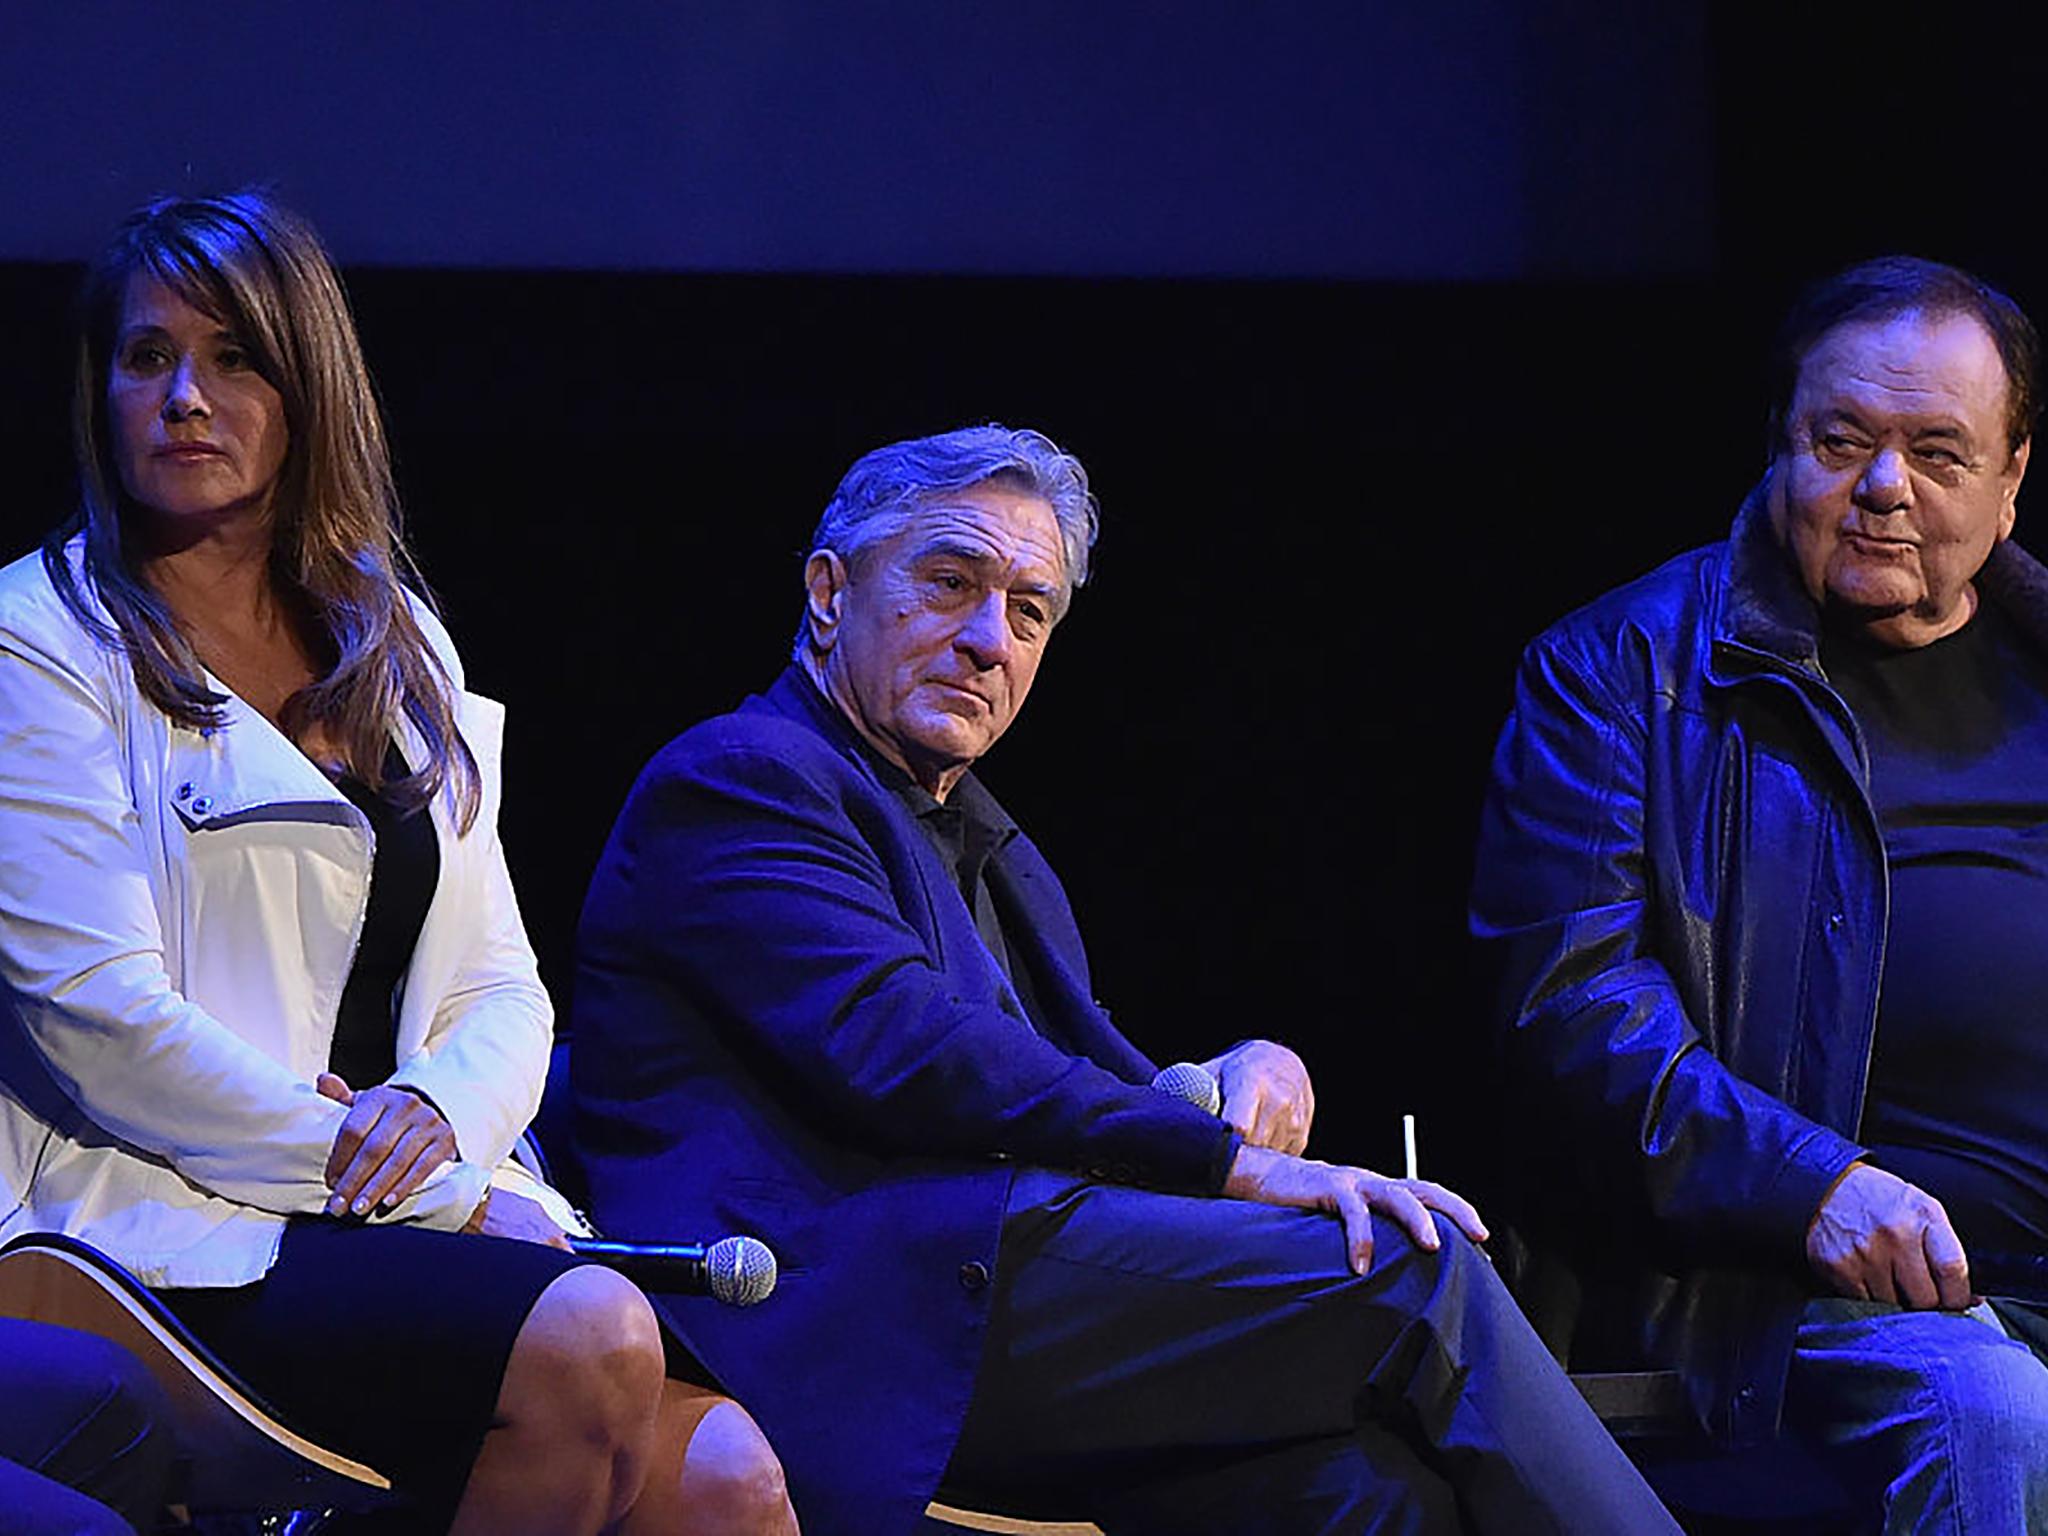 Lorraine Bracco, Robert De Niro and Paul Sorvino attend a 25th anniversary screening of 'Goodfellas' in 2015